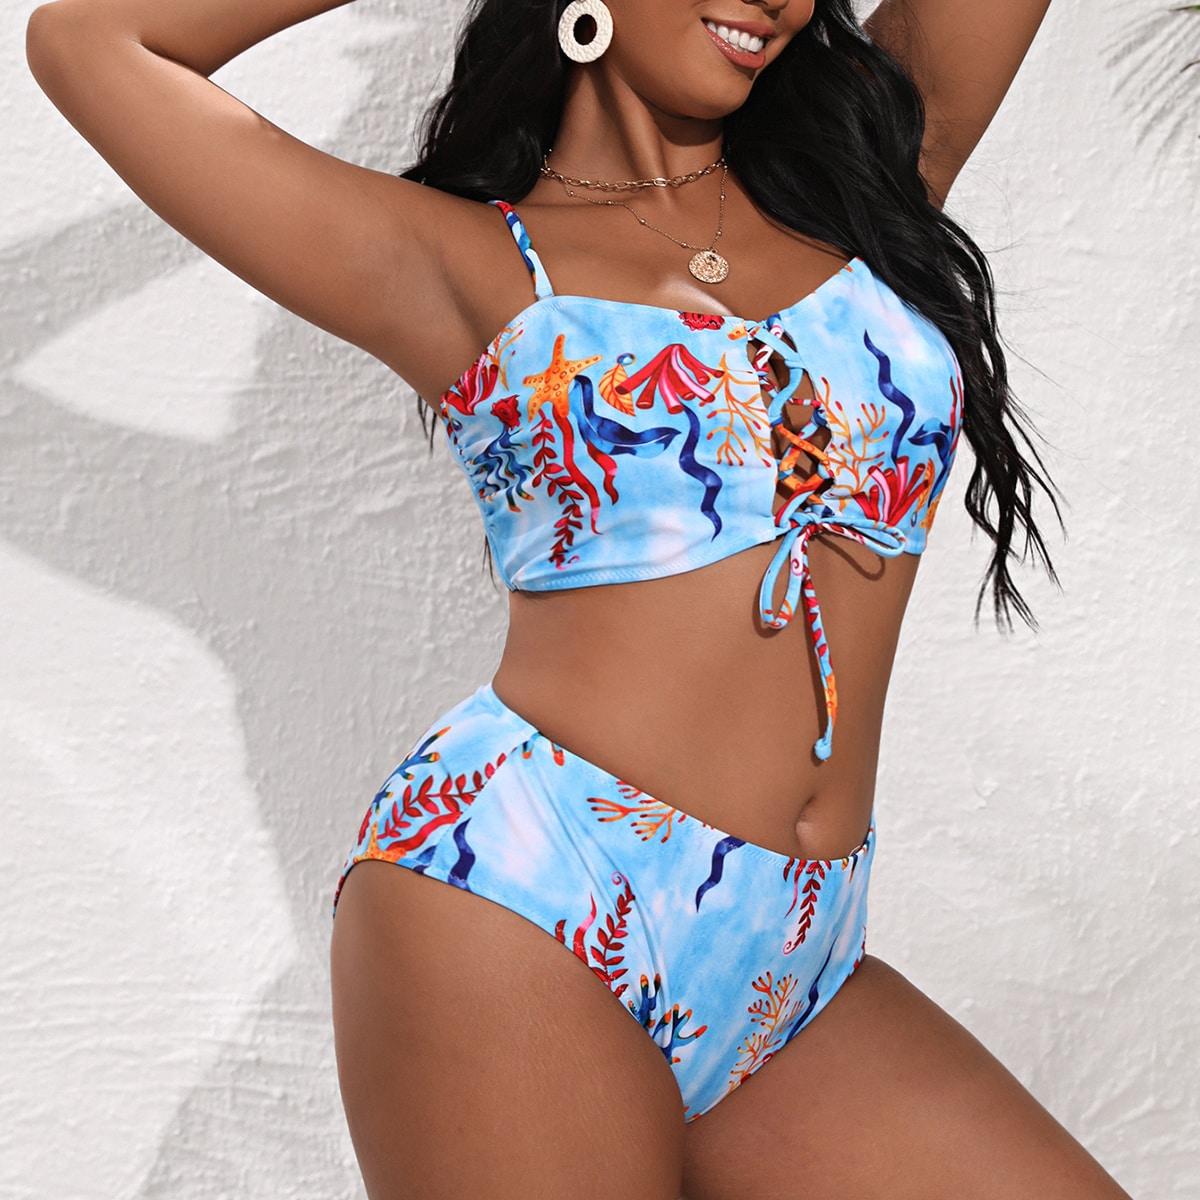 Bikini mit Meerespflanze Muster und Band